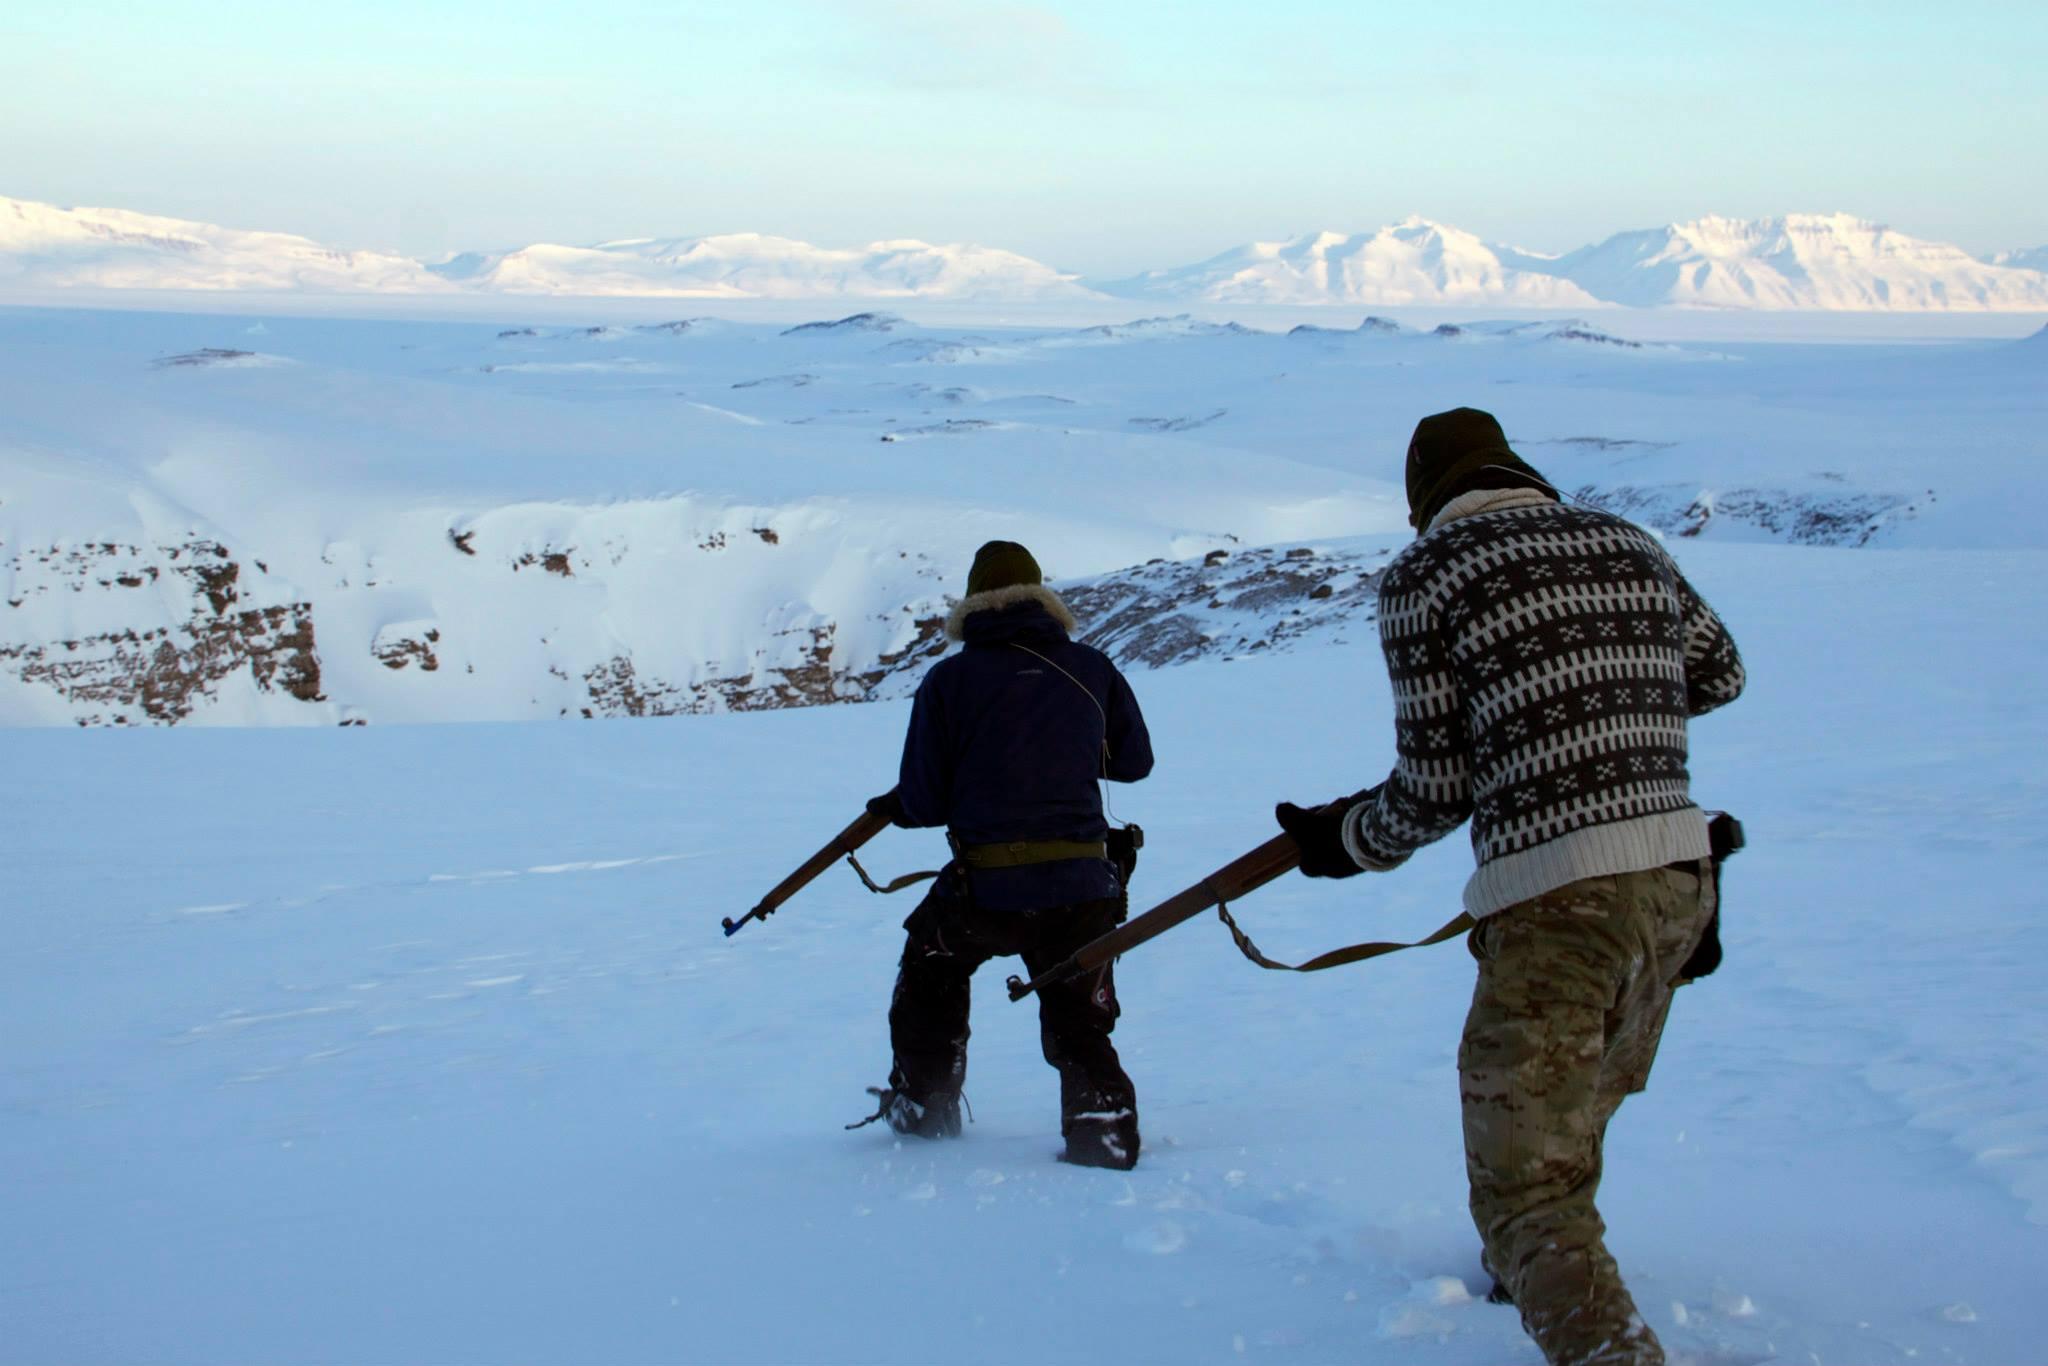 Candidates for Slædepatruljen Sirius learn to hunt near Mestersvig, Greenland. [2048x1366]